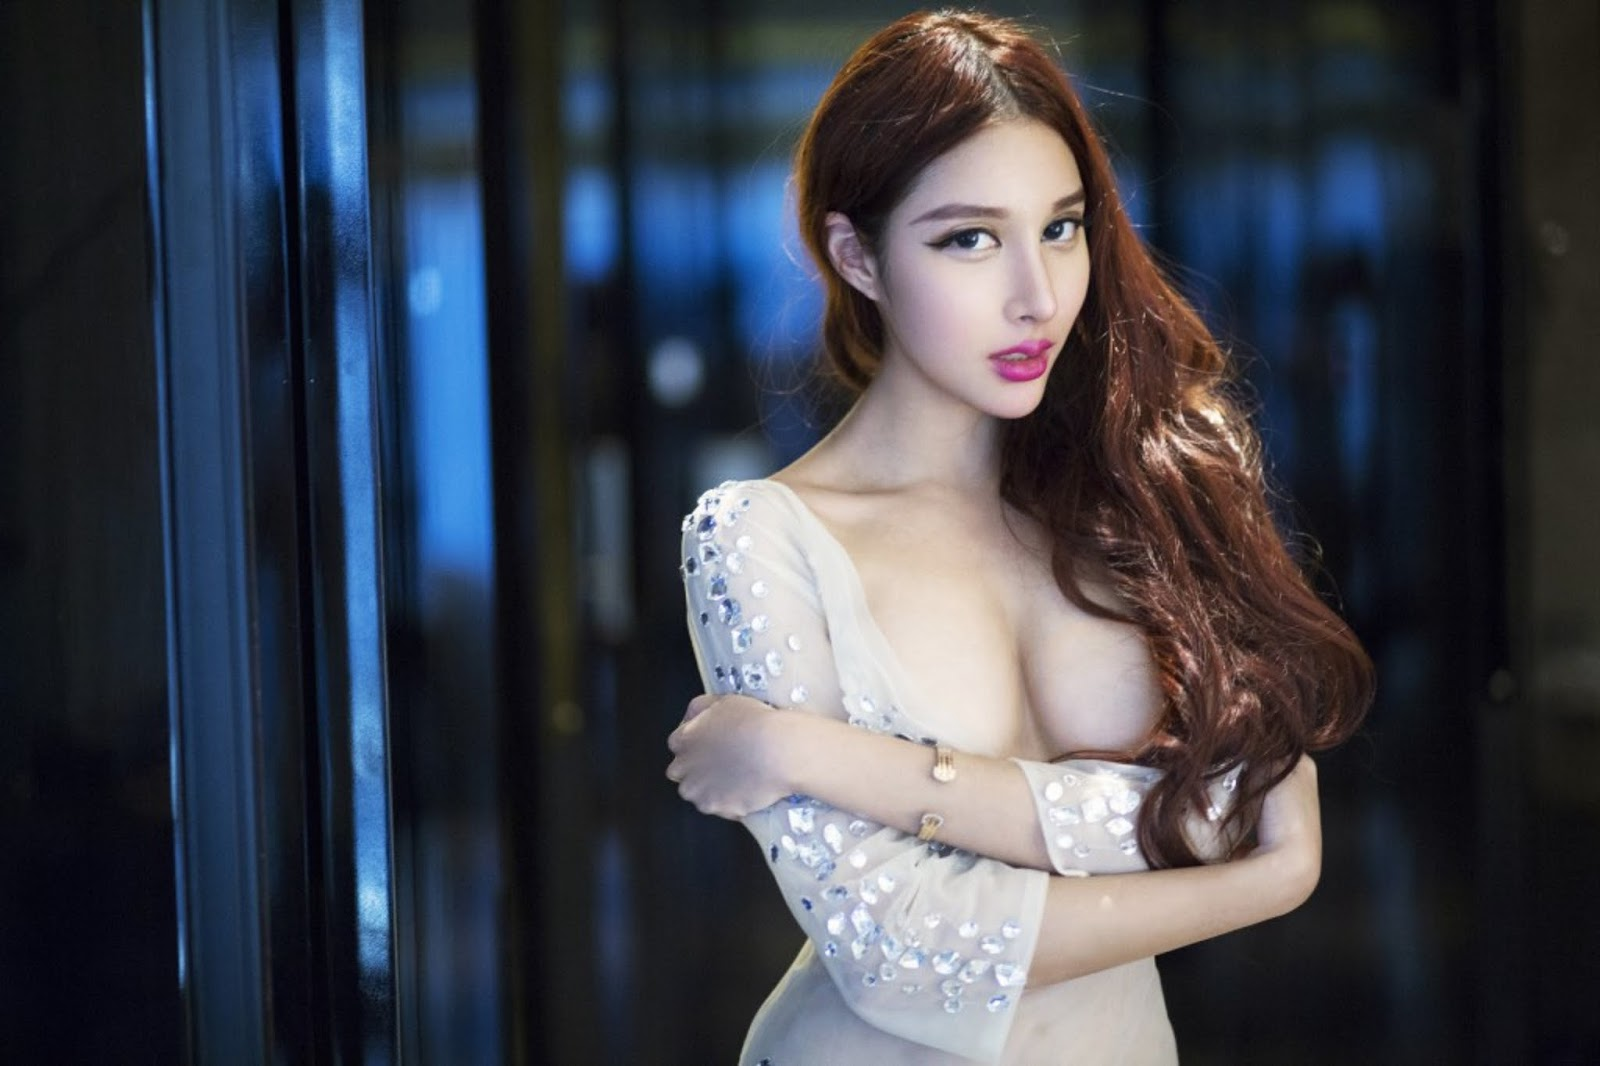 %25C2%25B1 %25C2%25B1 20 - Model Nude TUIGIRL NO.49 Beauty Body Tits